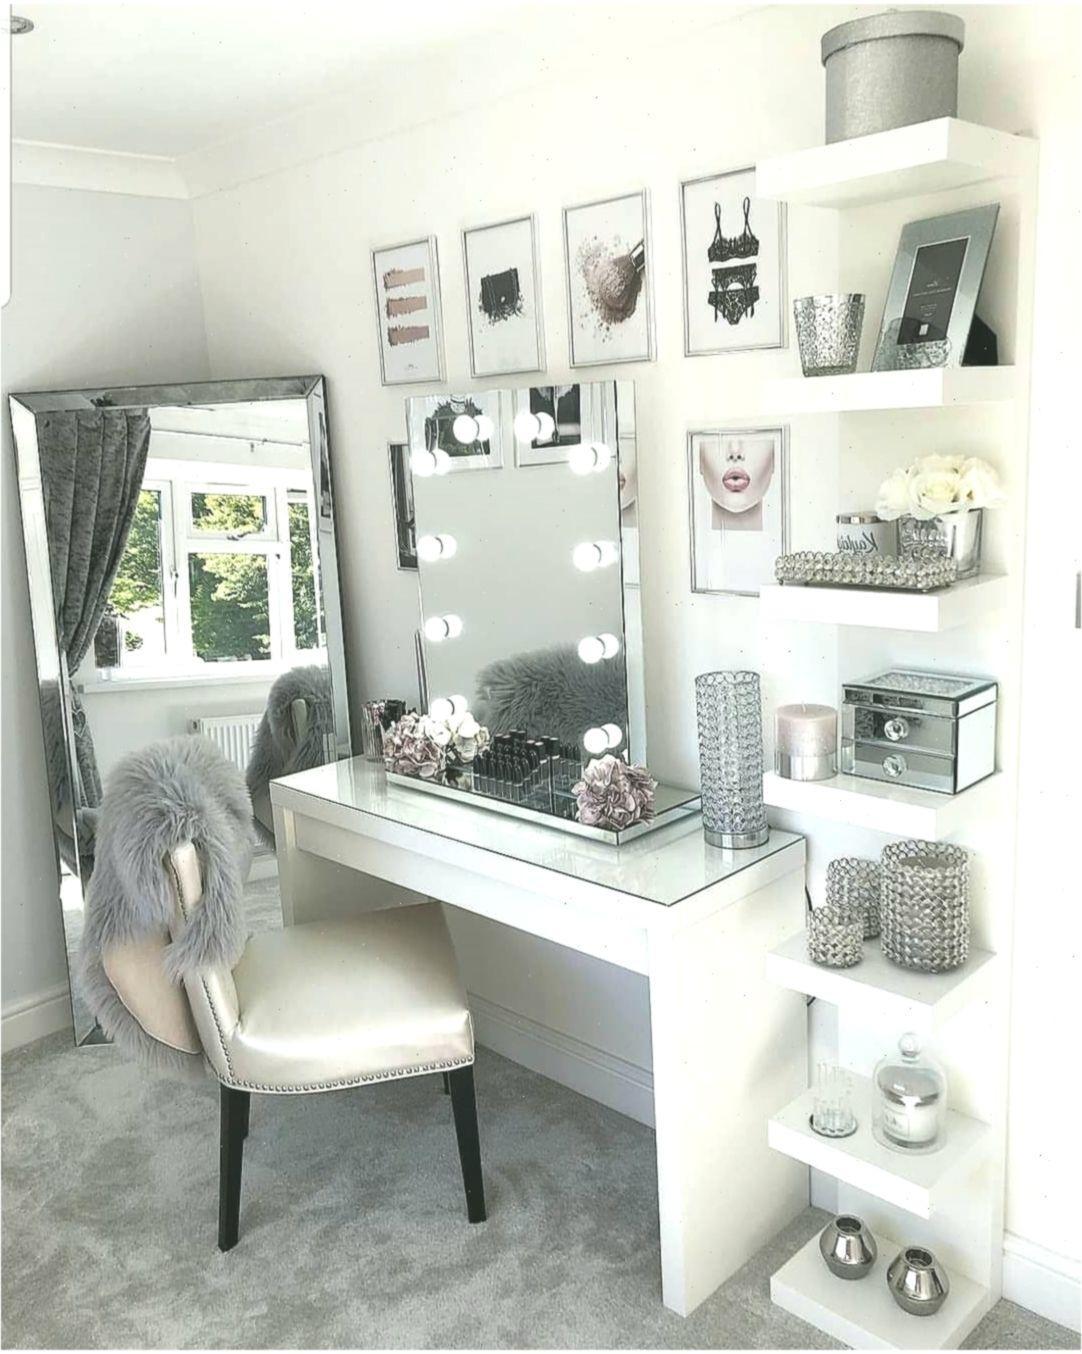 Photo of Glam beauty room vanity decor penteadeira #SchlafzimmerDekor #bedroomdecorglam